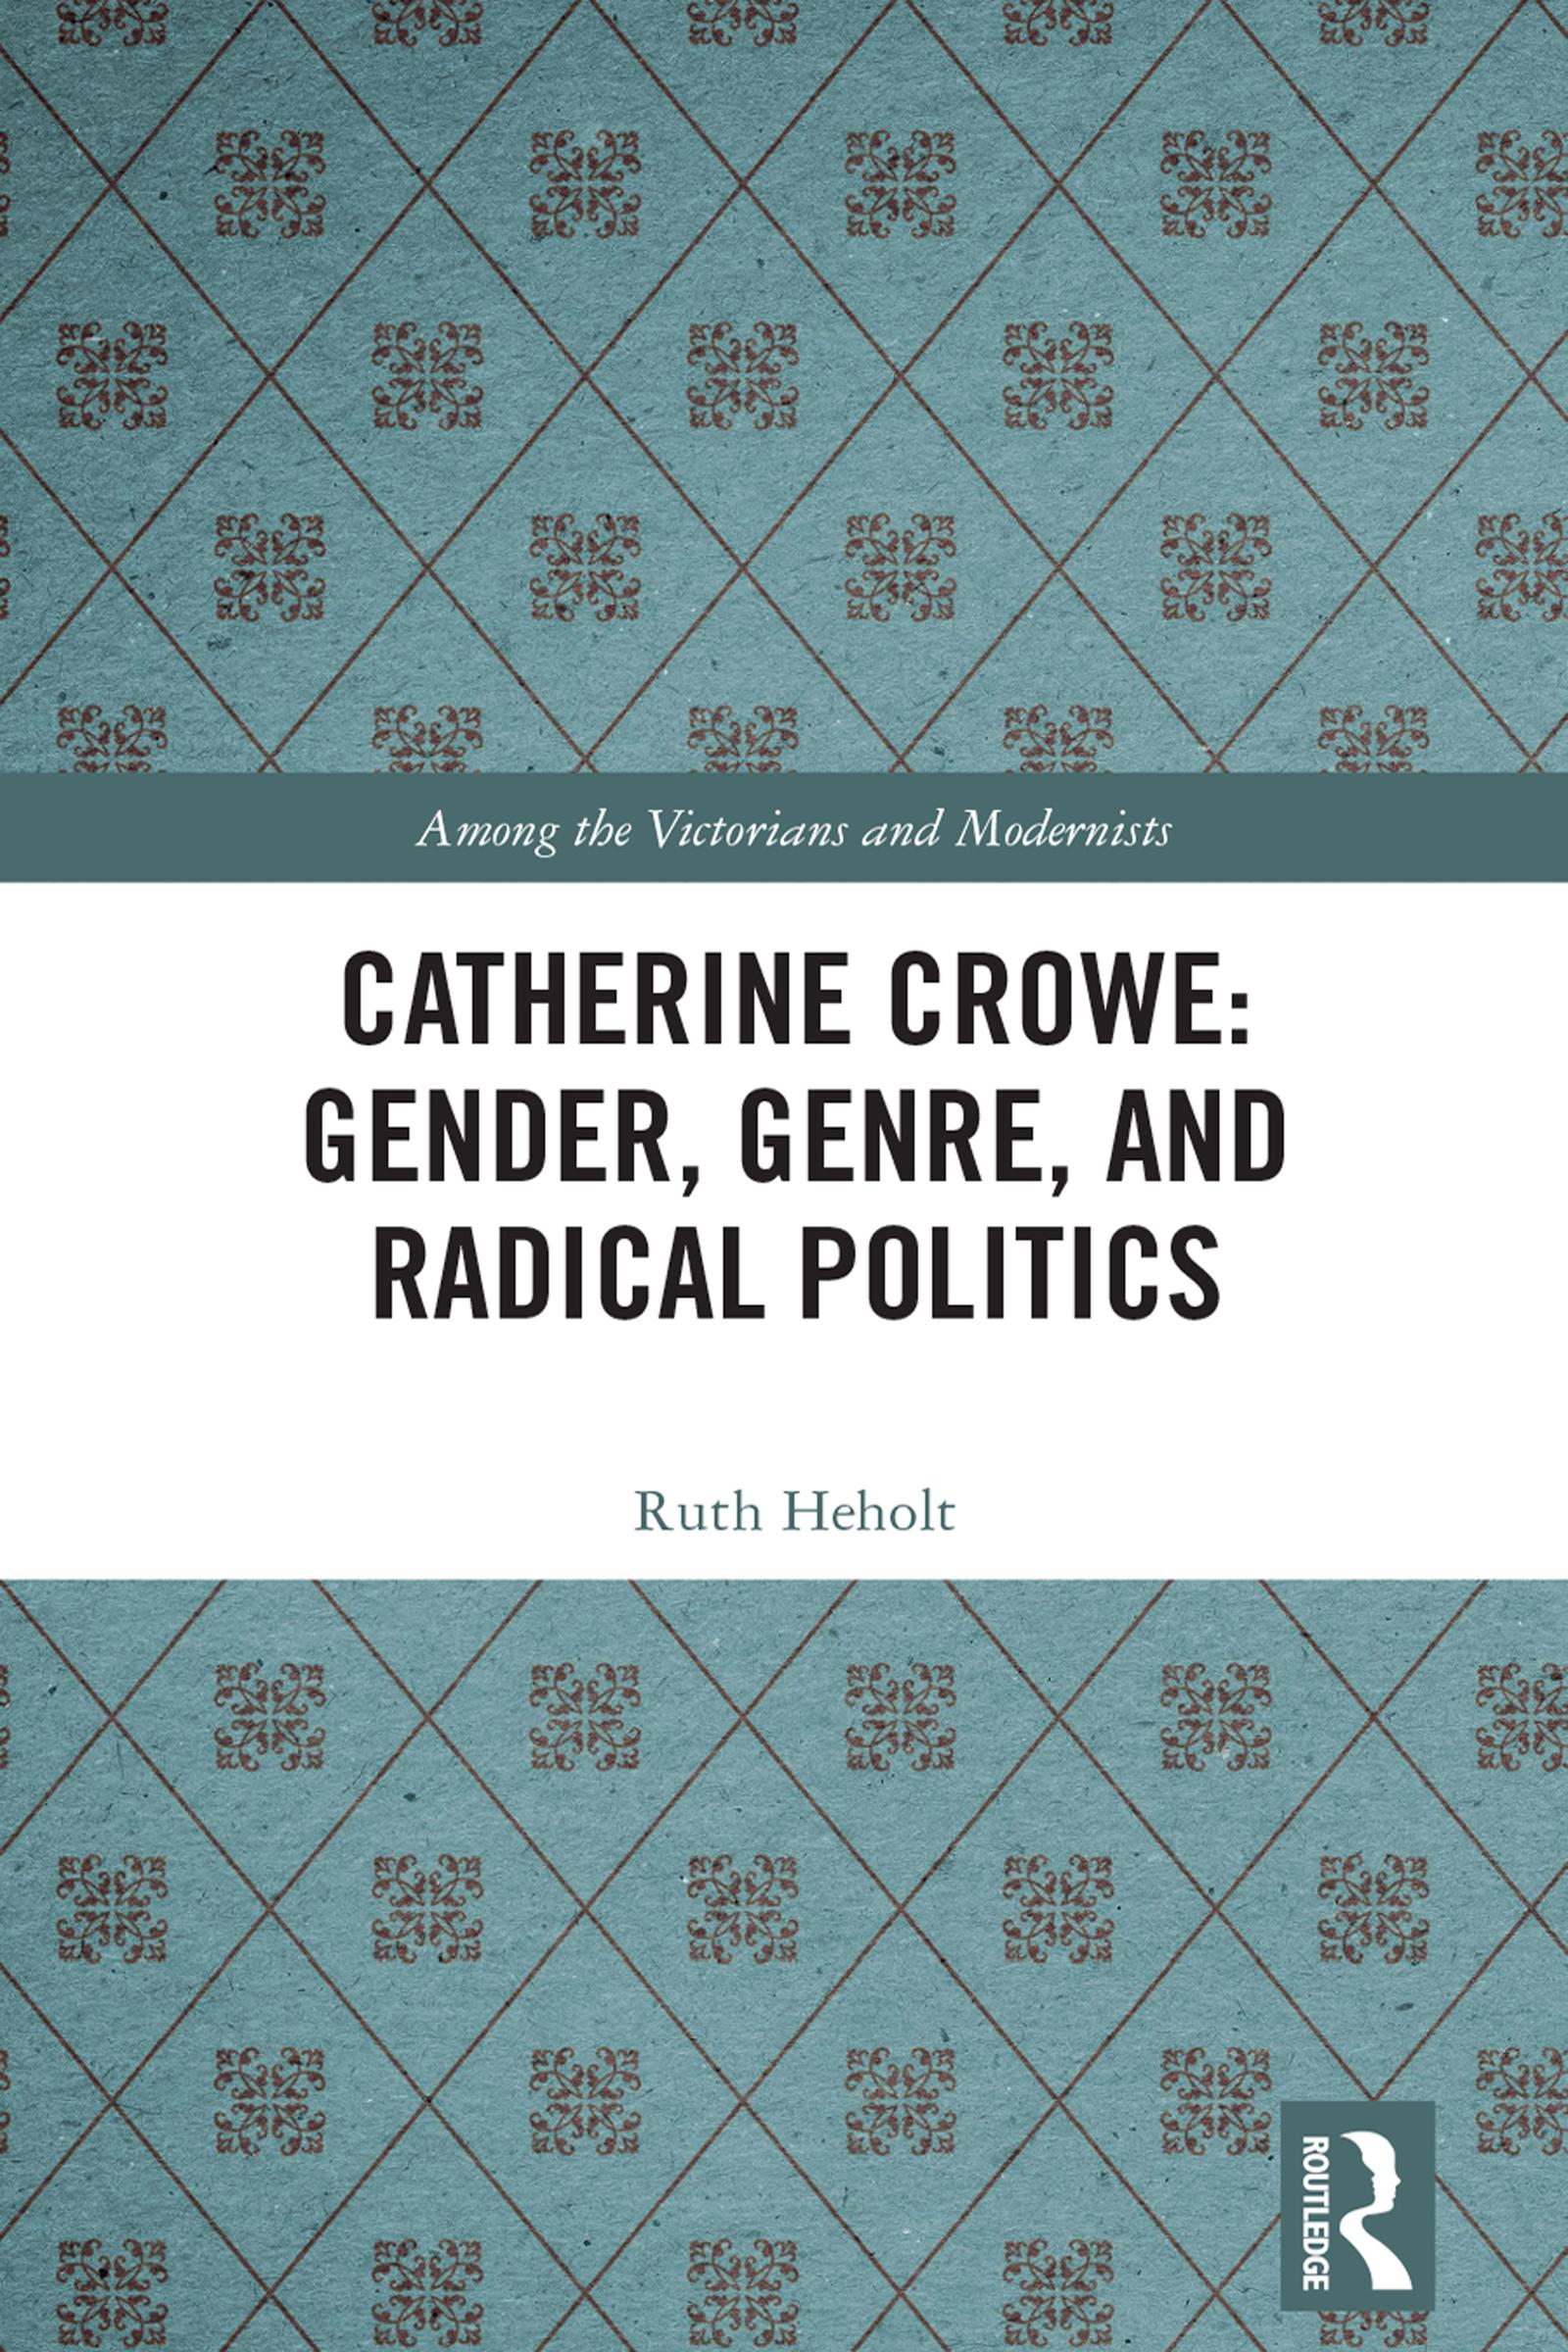 Catherine Crowe: Gender, Genre, and Radical Politics